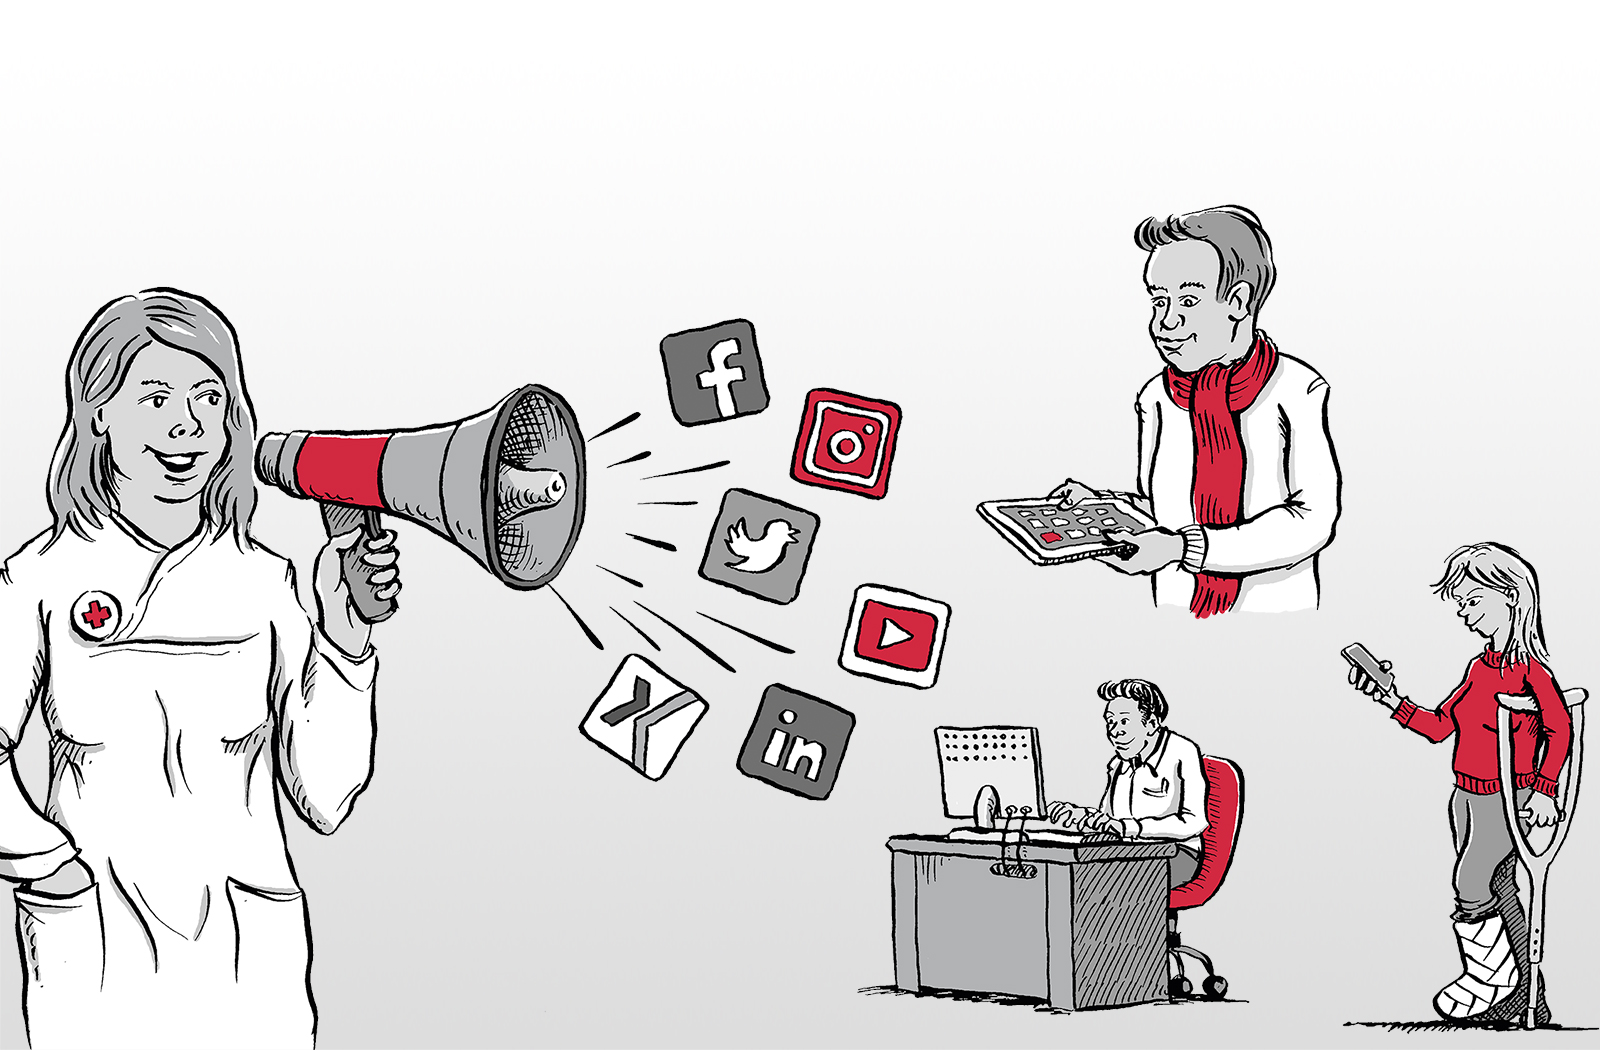 190212_Merkblatt_Gesundheitsmarketing-Social-Media_1600x1050px